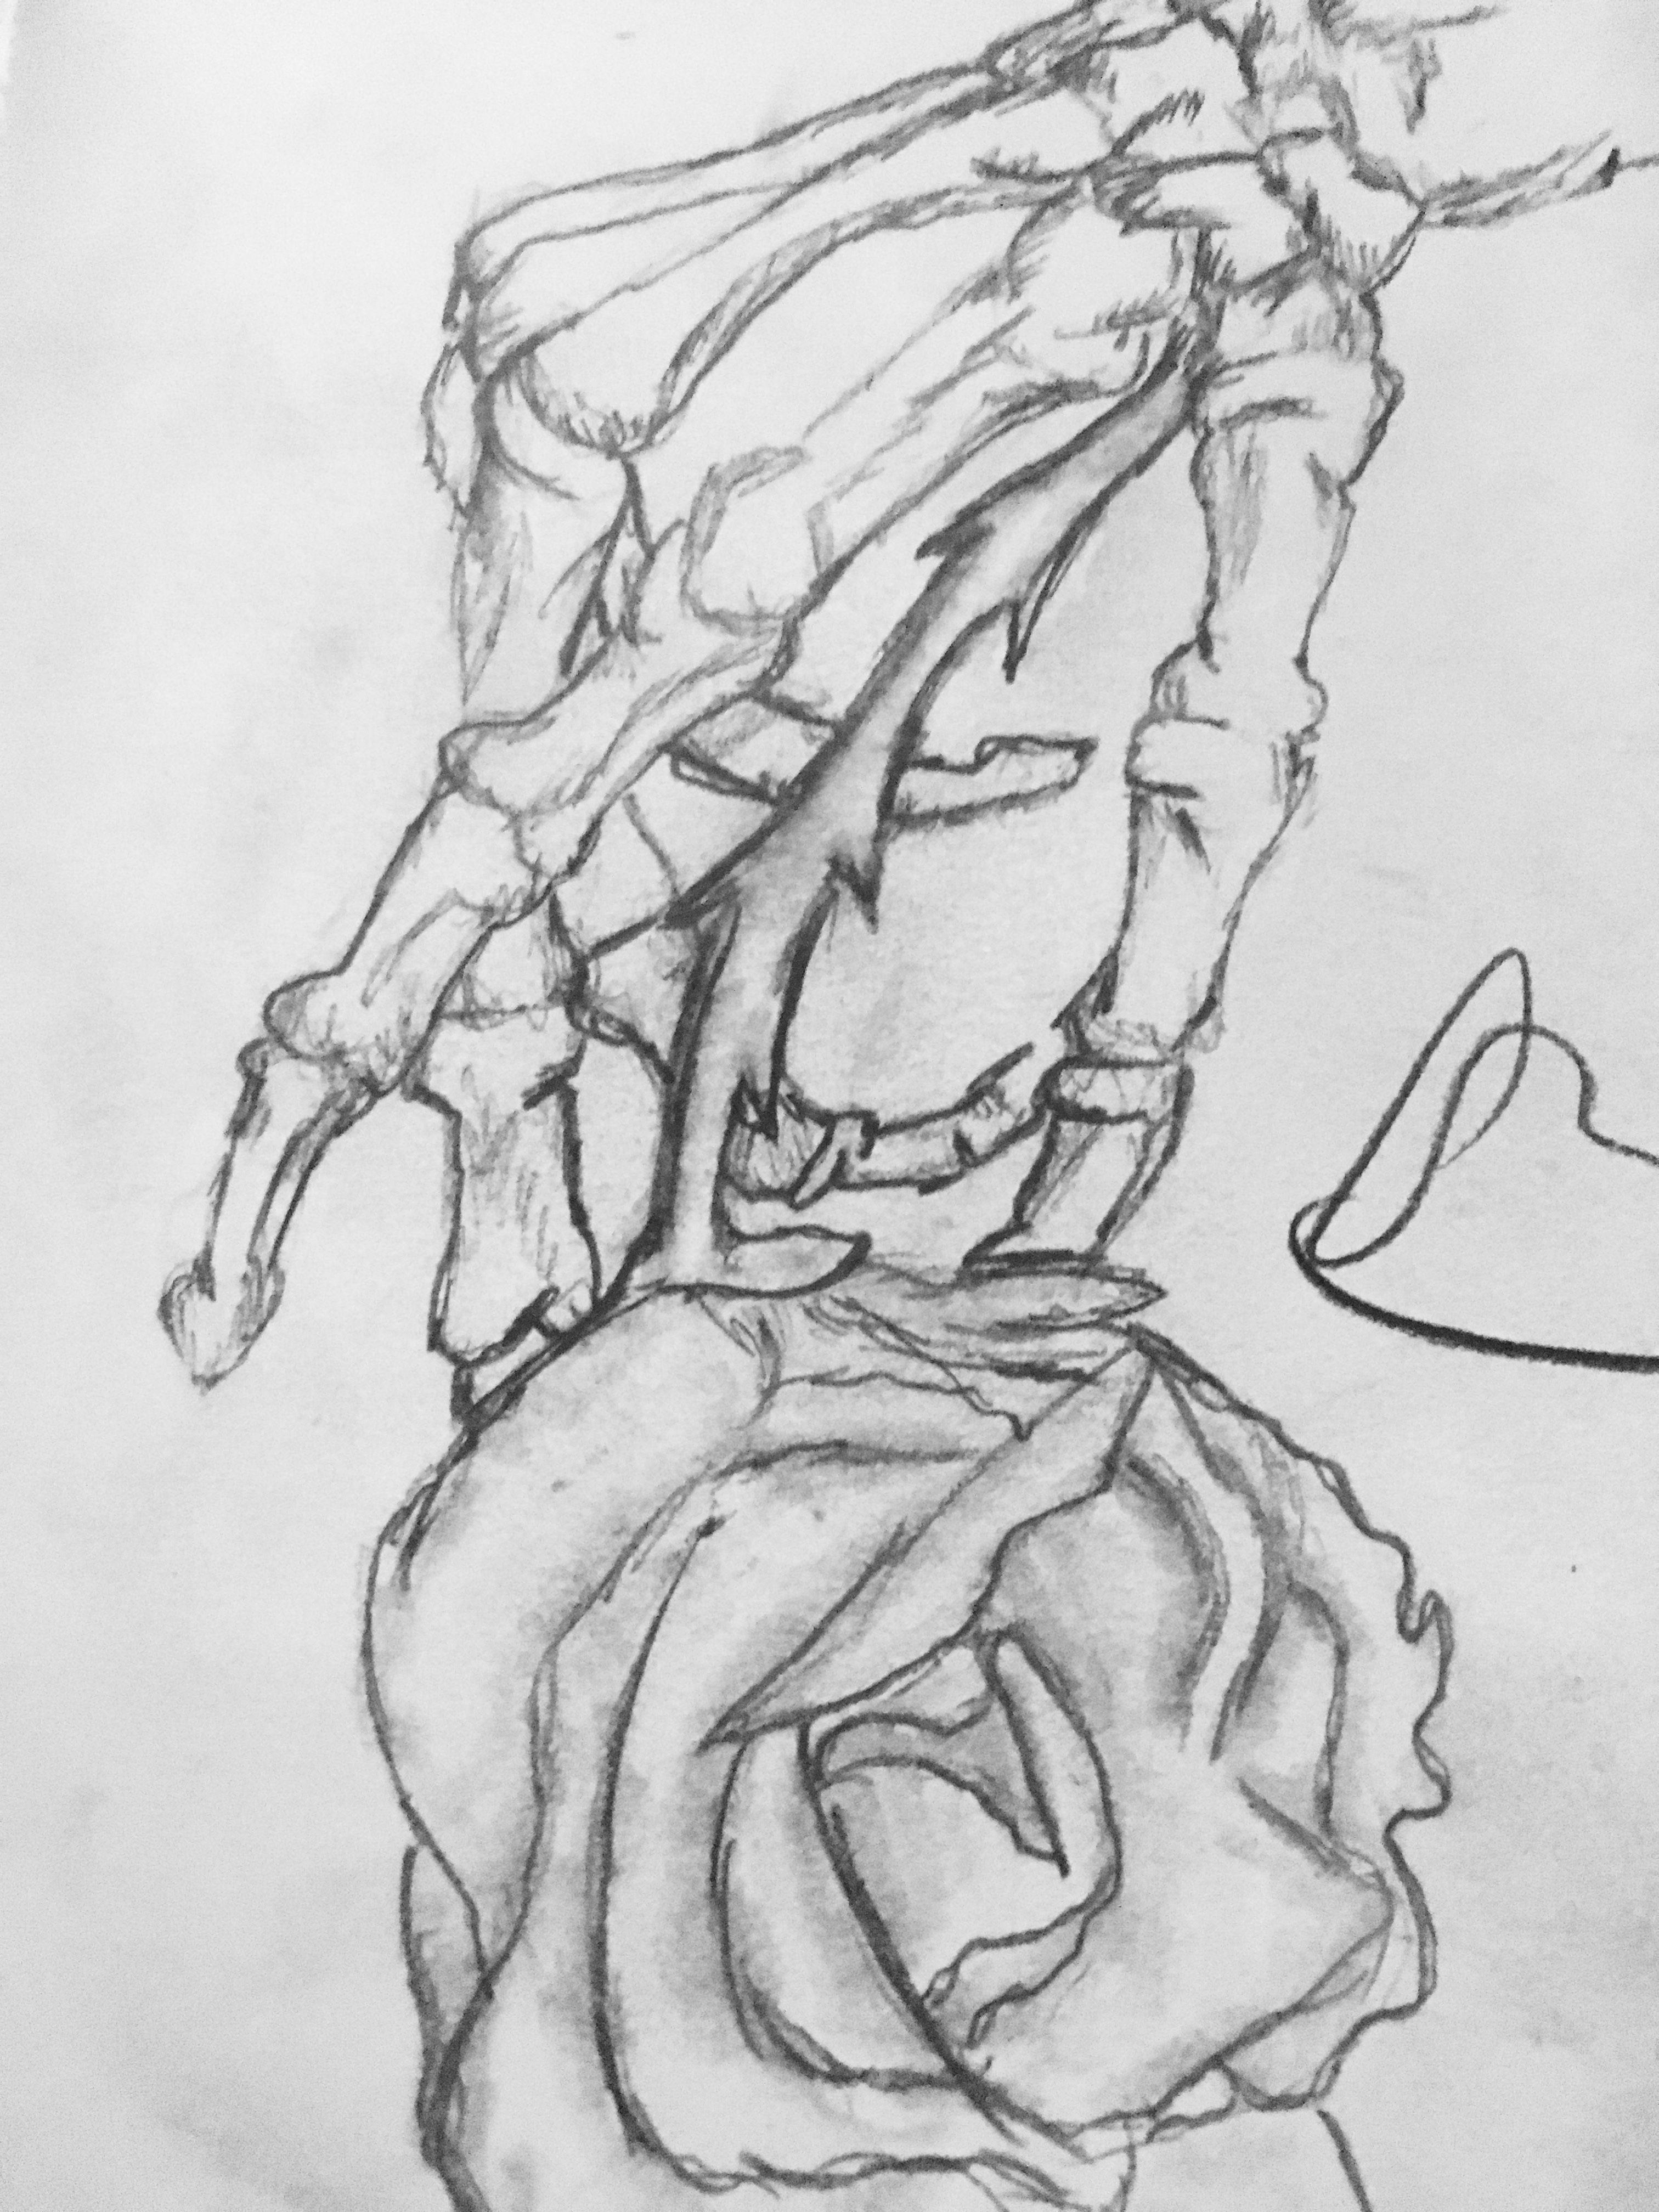 Skeleton hand holding rose 🥀 Hand holding rose, Skeleton